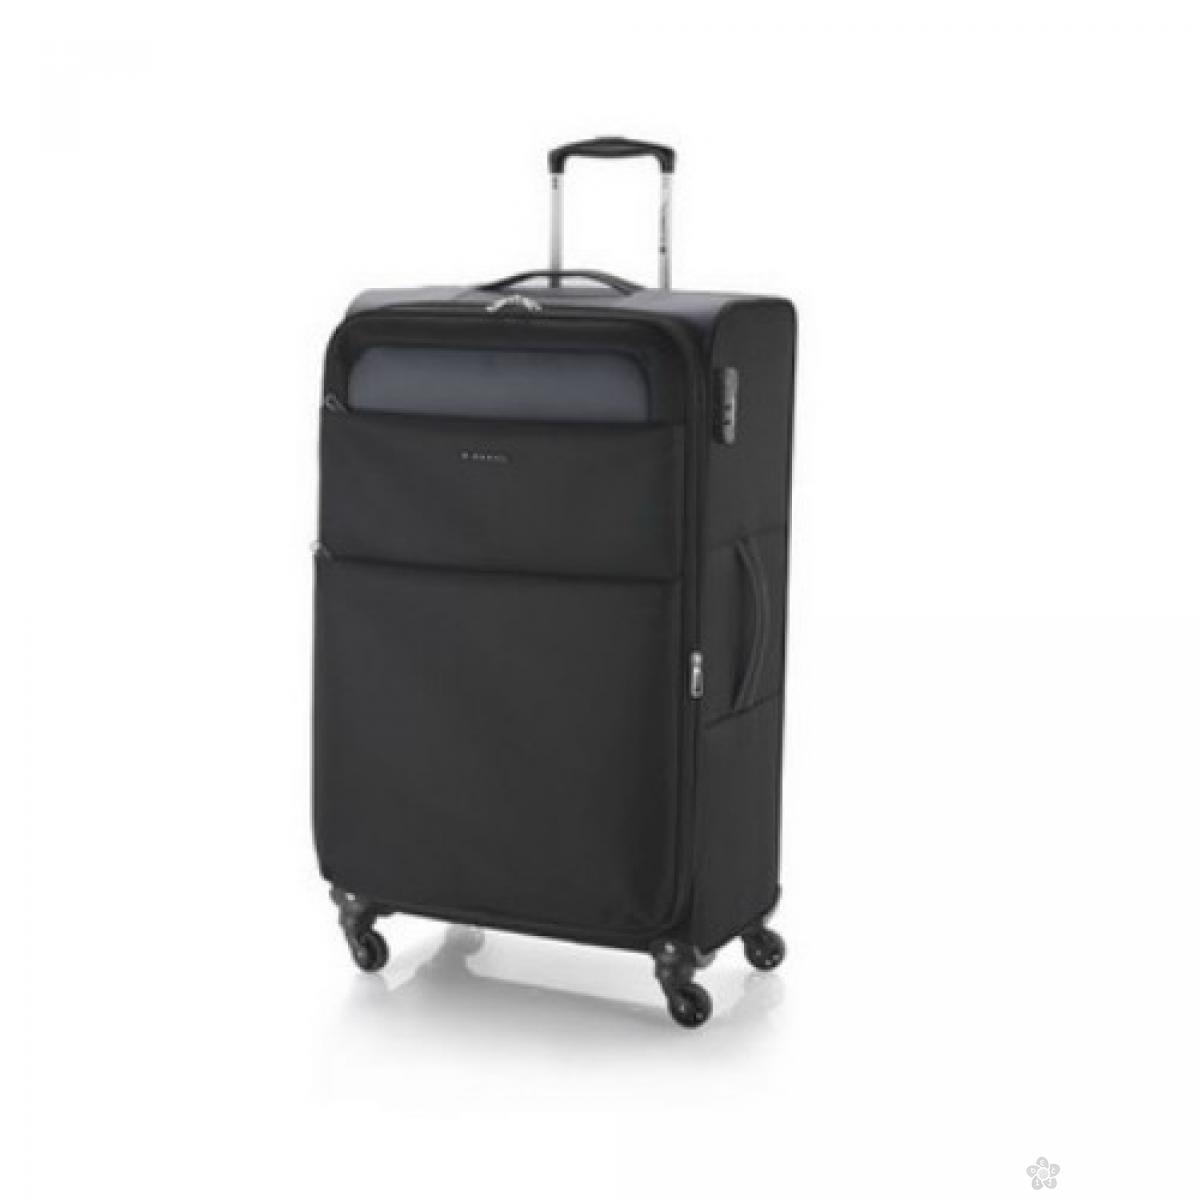 Kofer veliki polyester Cloud ultra light crna, 16KG114047B